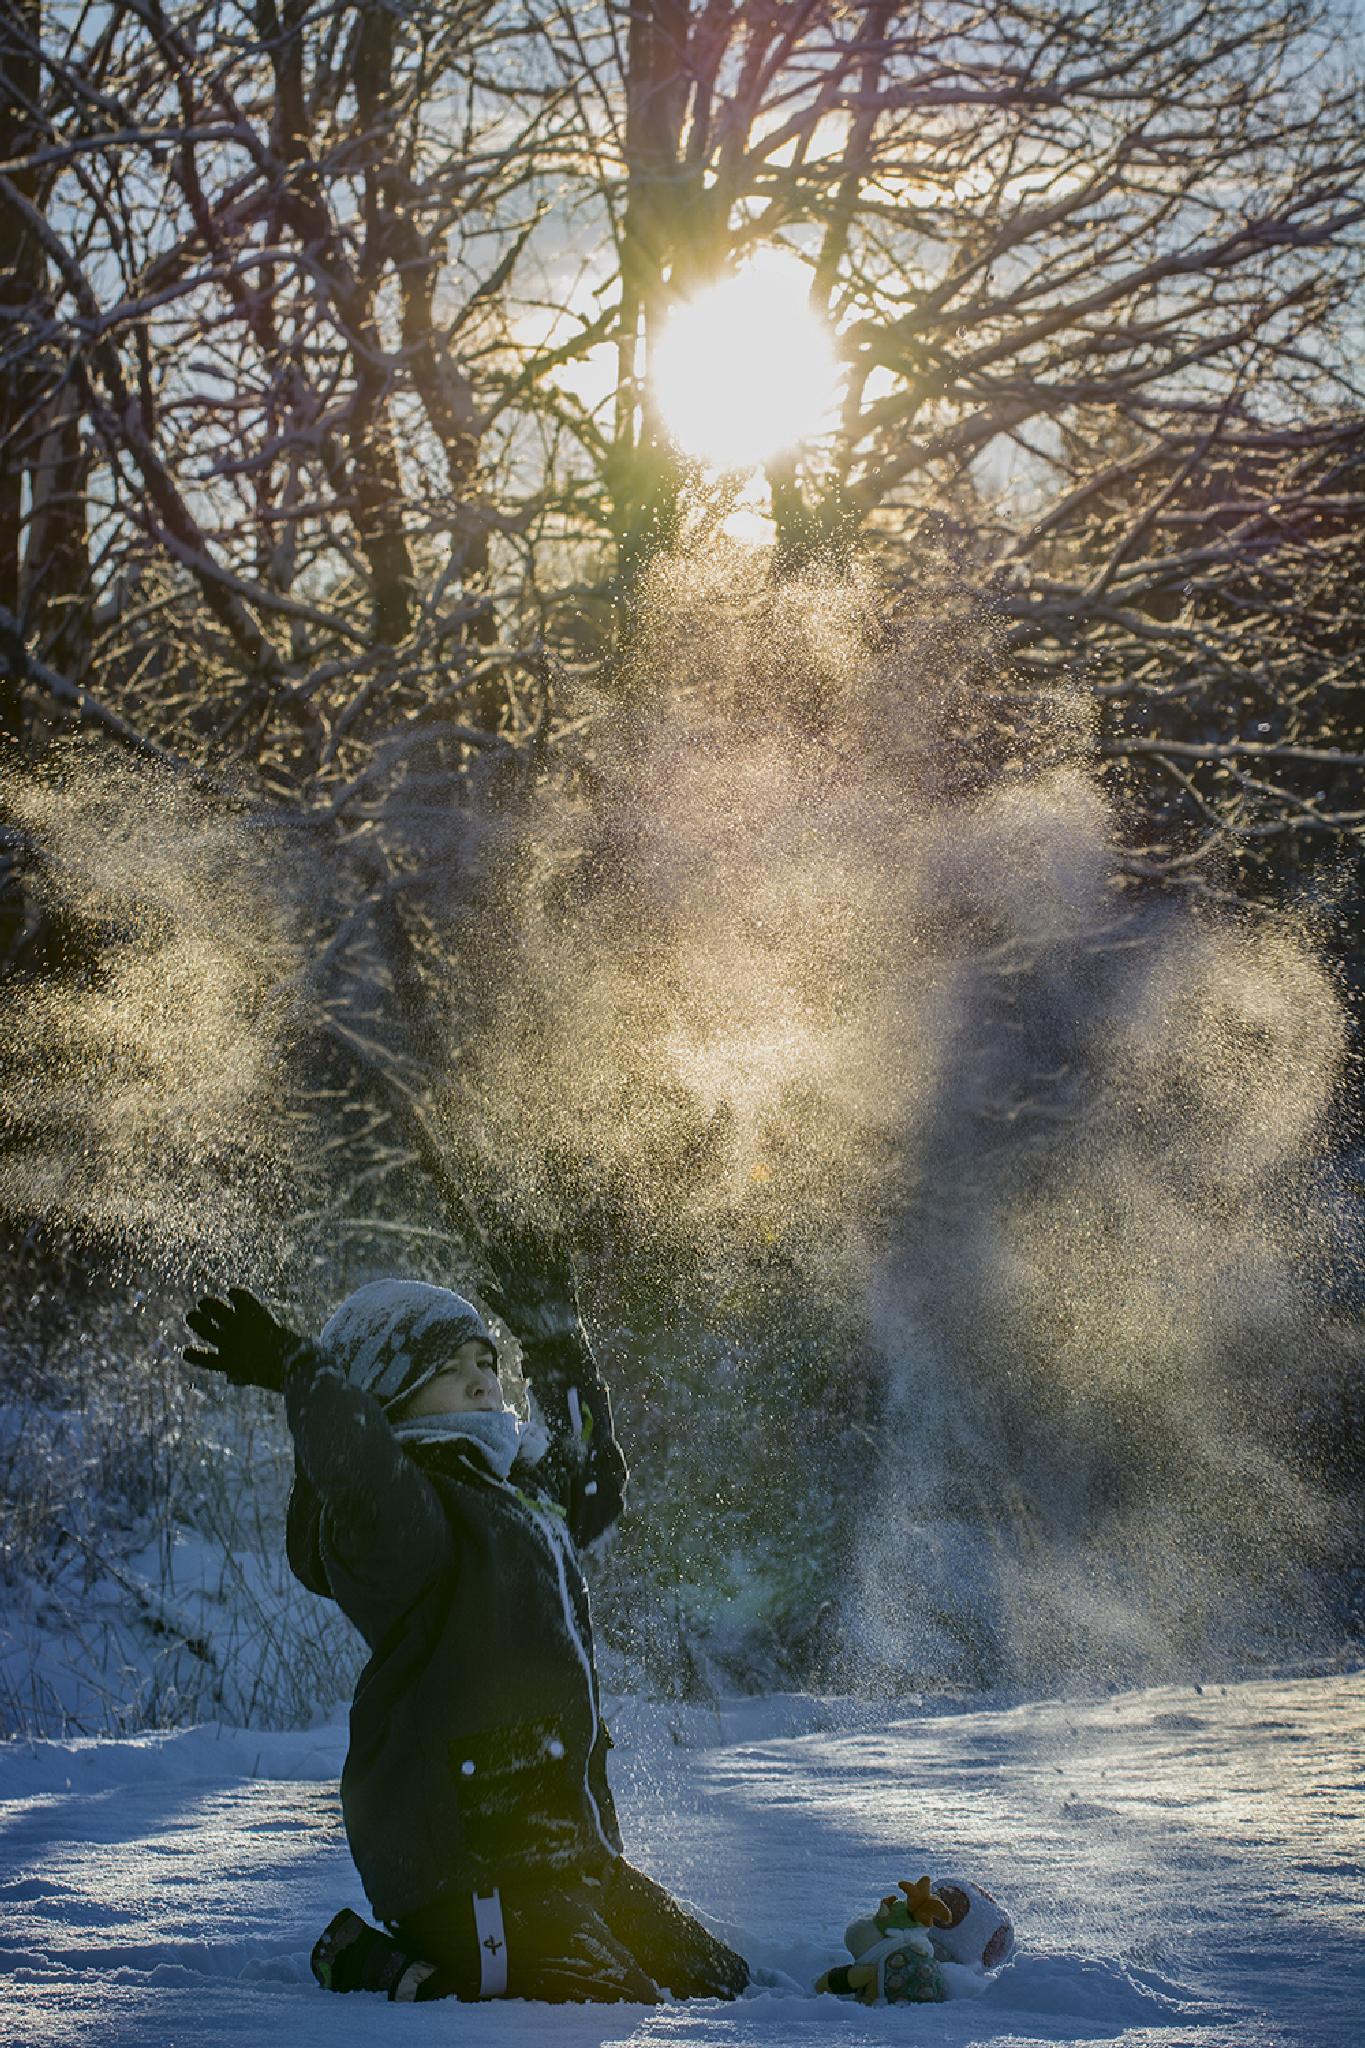 winter day by Helge Skogsrud